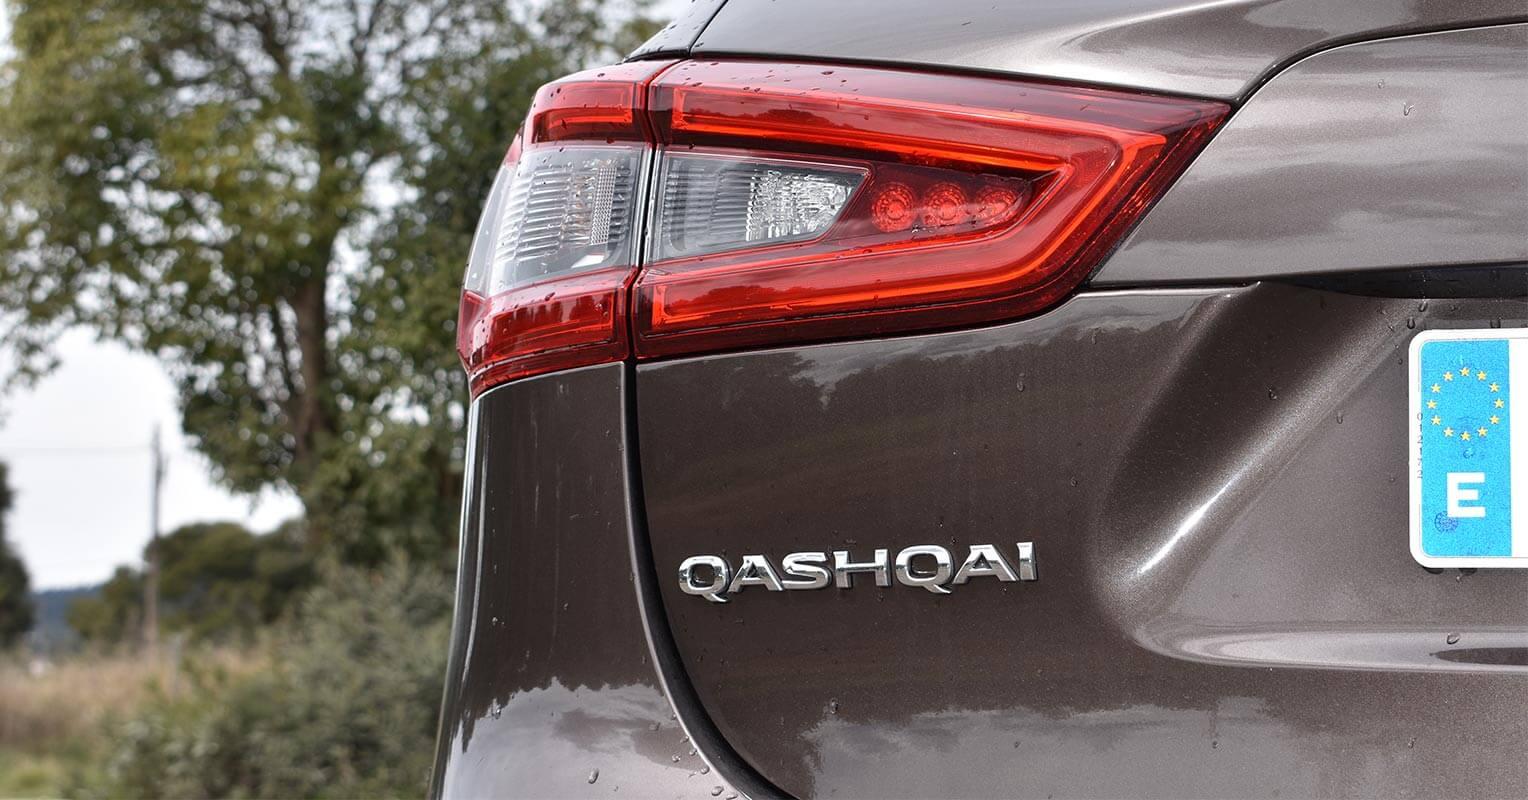 Piloto trasero del Nissan Qashqai